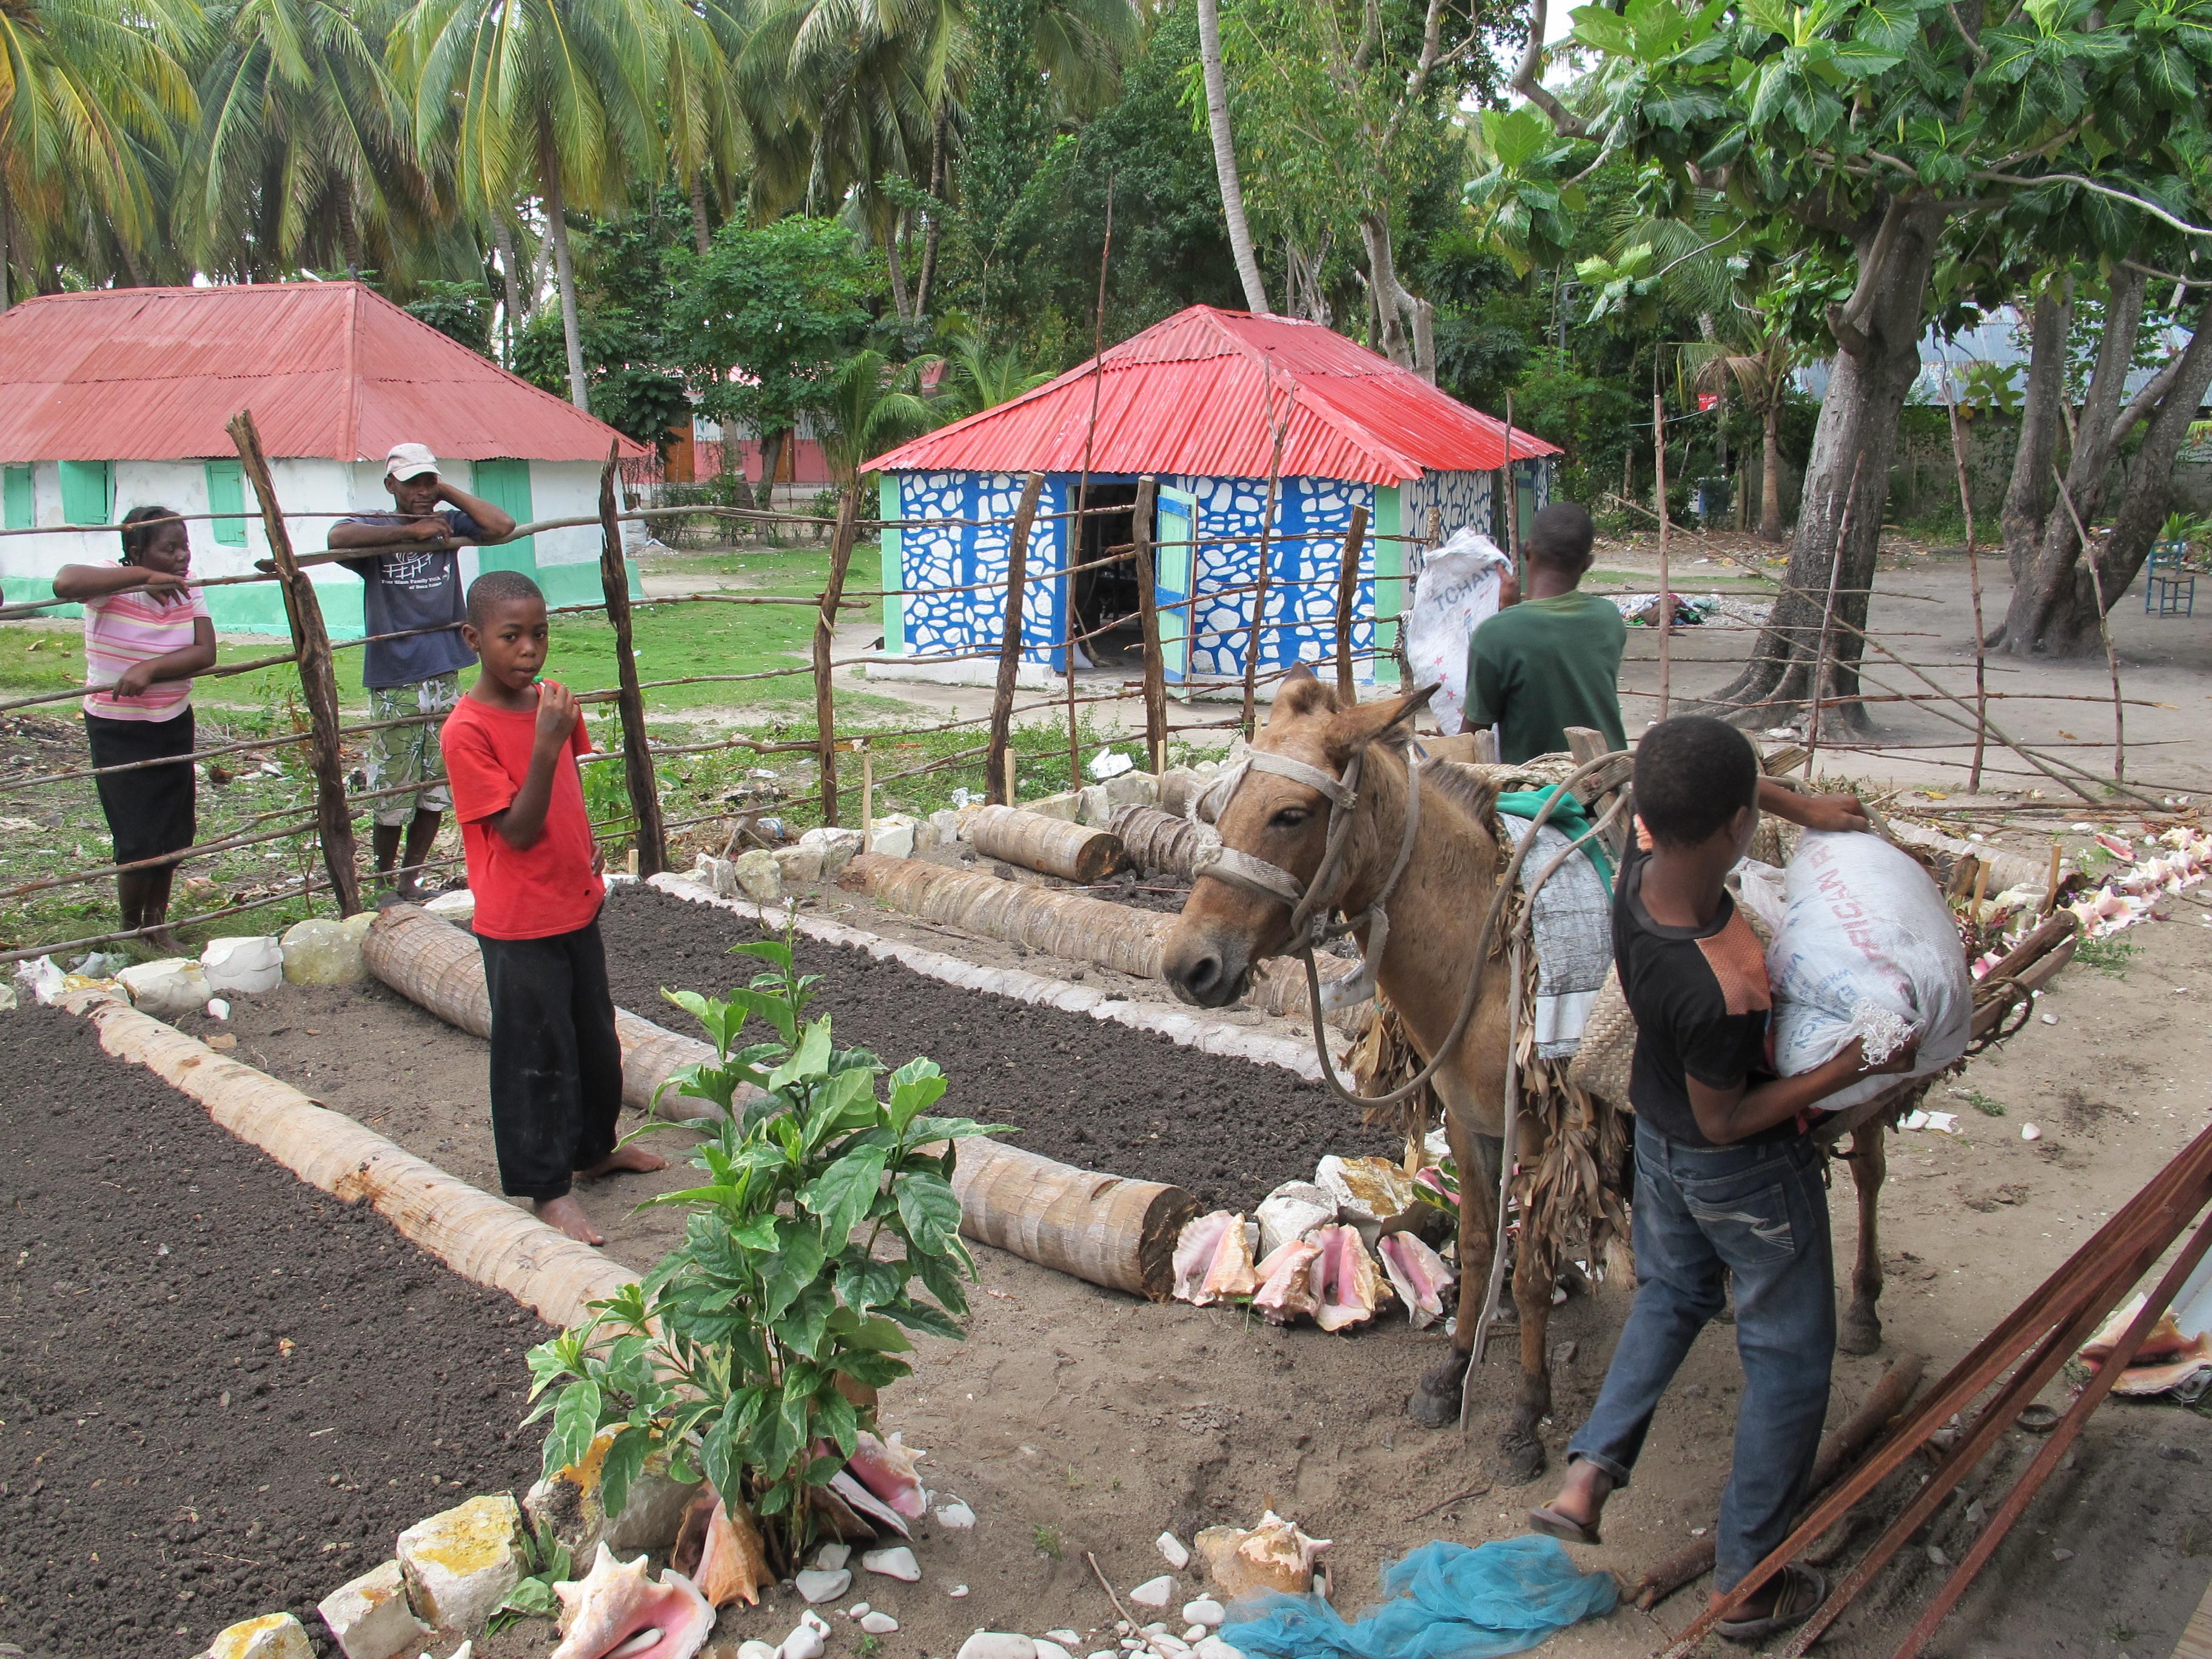 Hauling in dirt for the garden